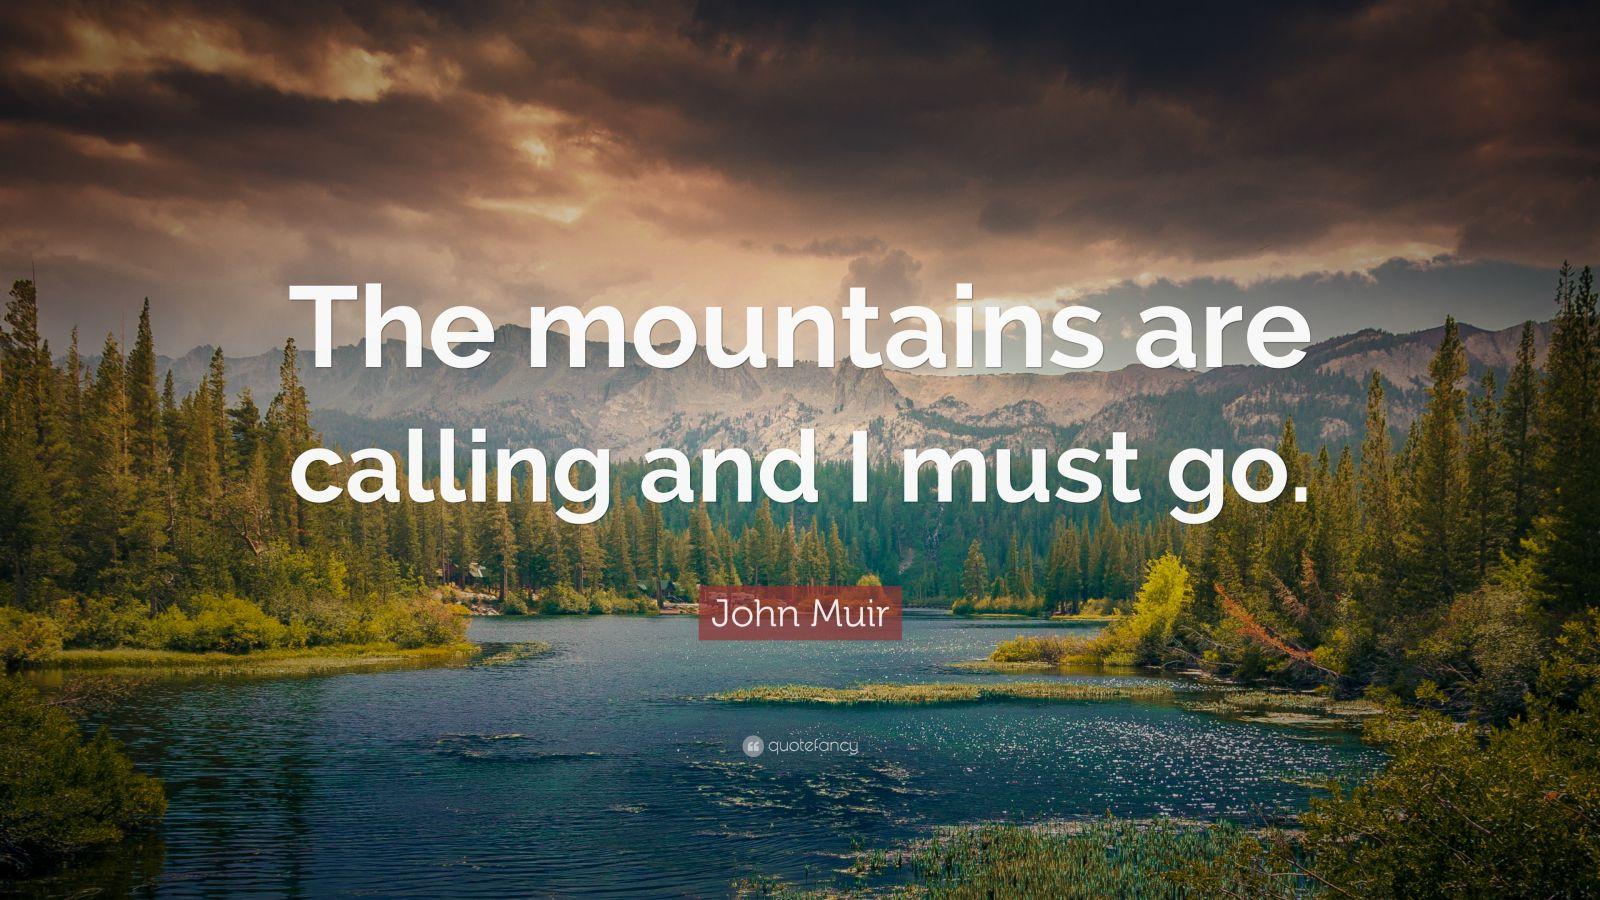 John Muir Quotes 100 Wallpapers Quotefancy